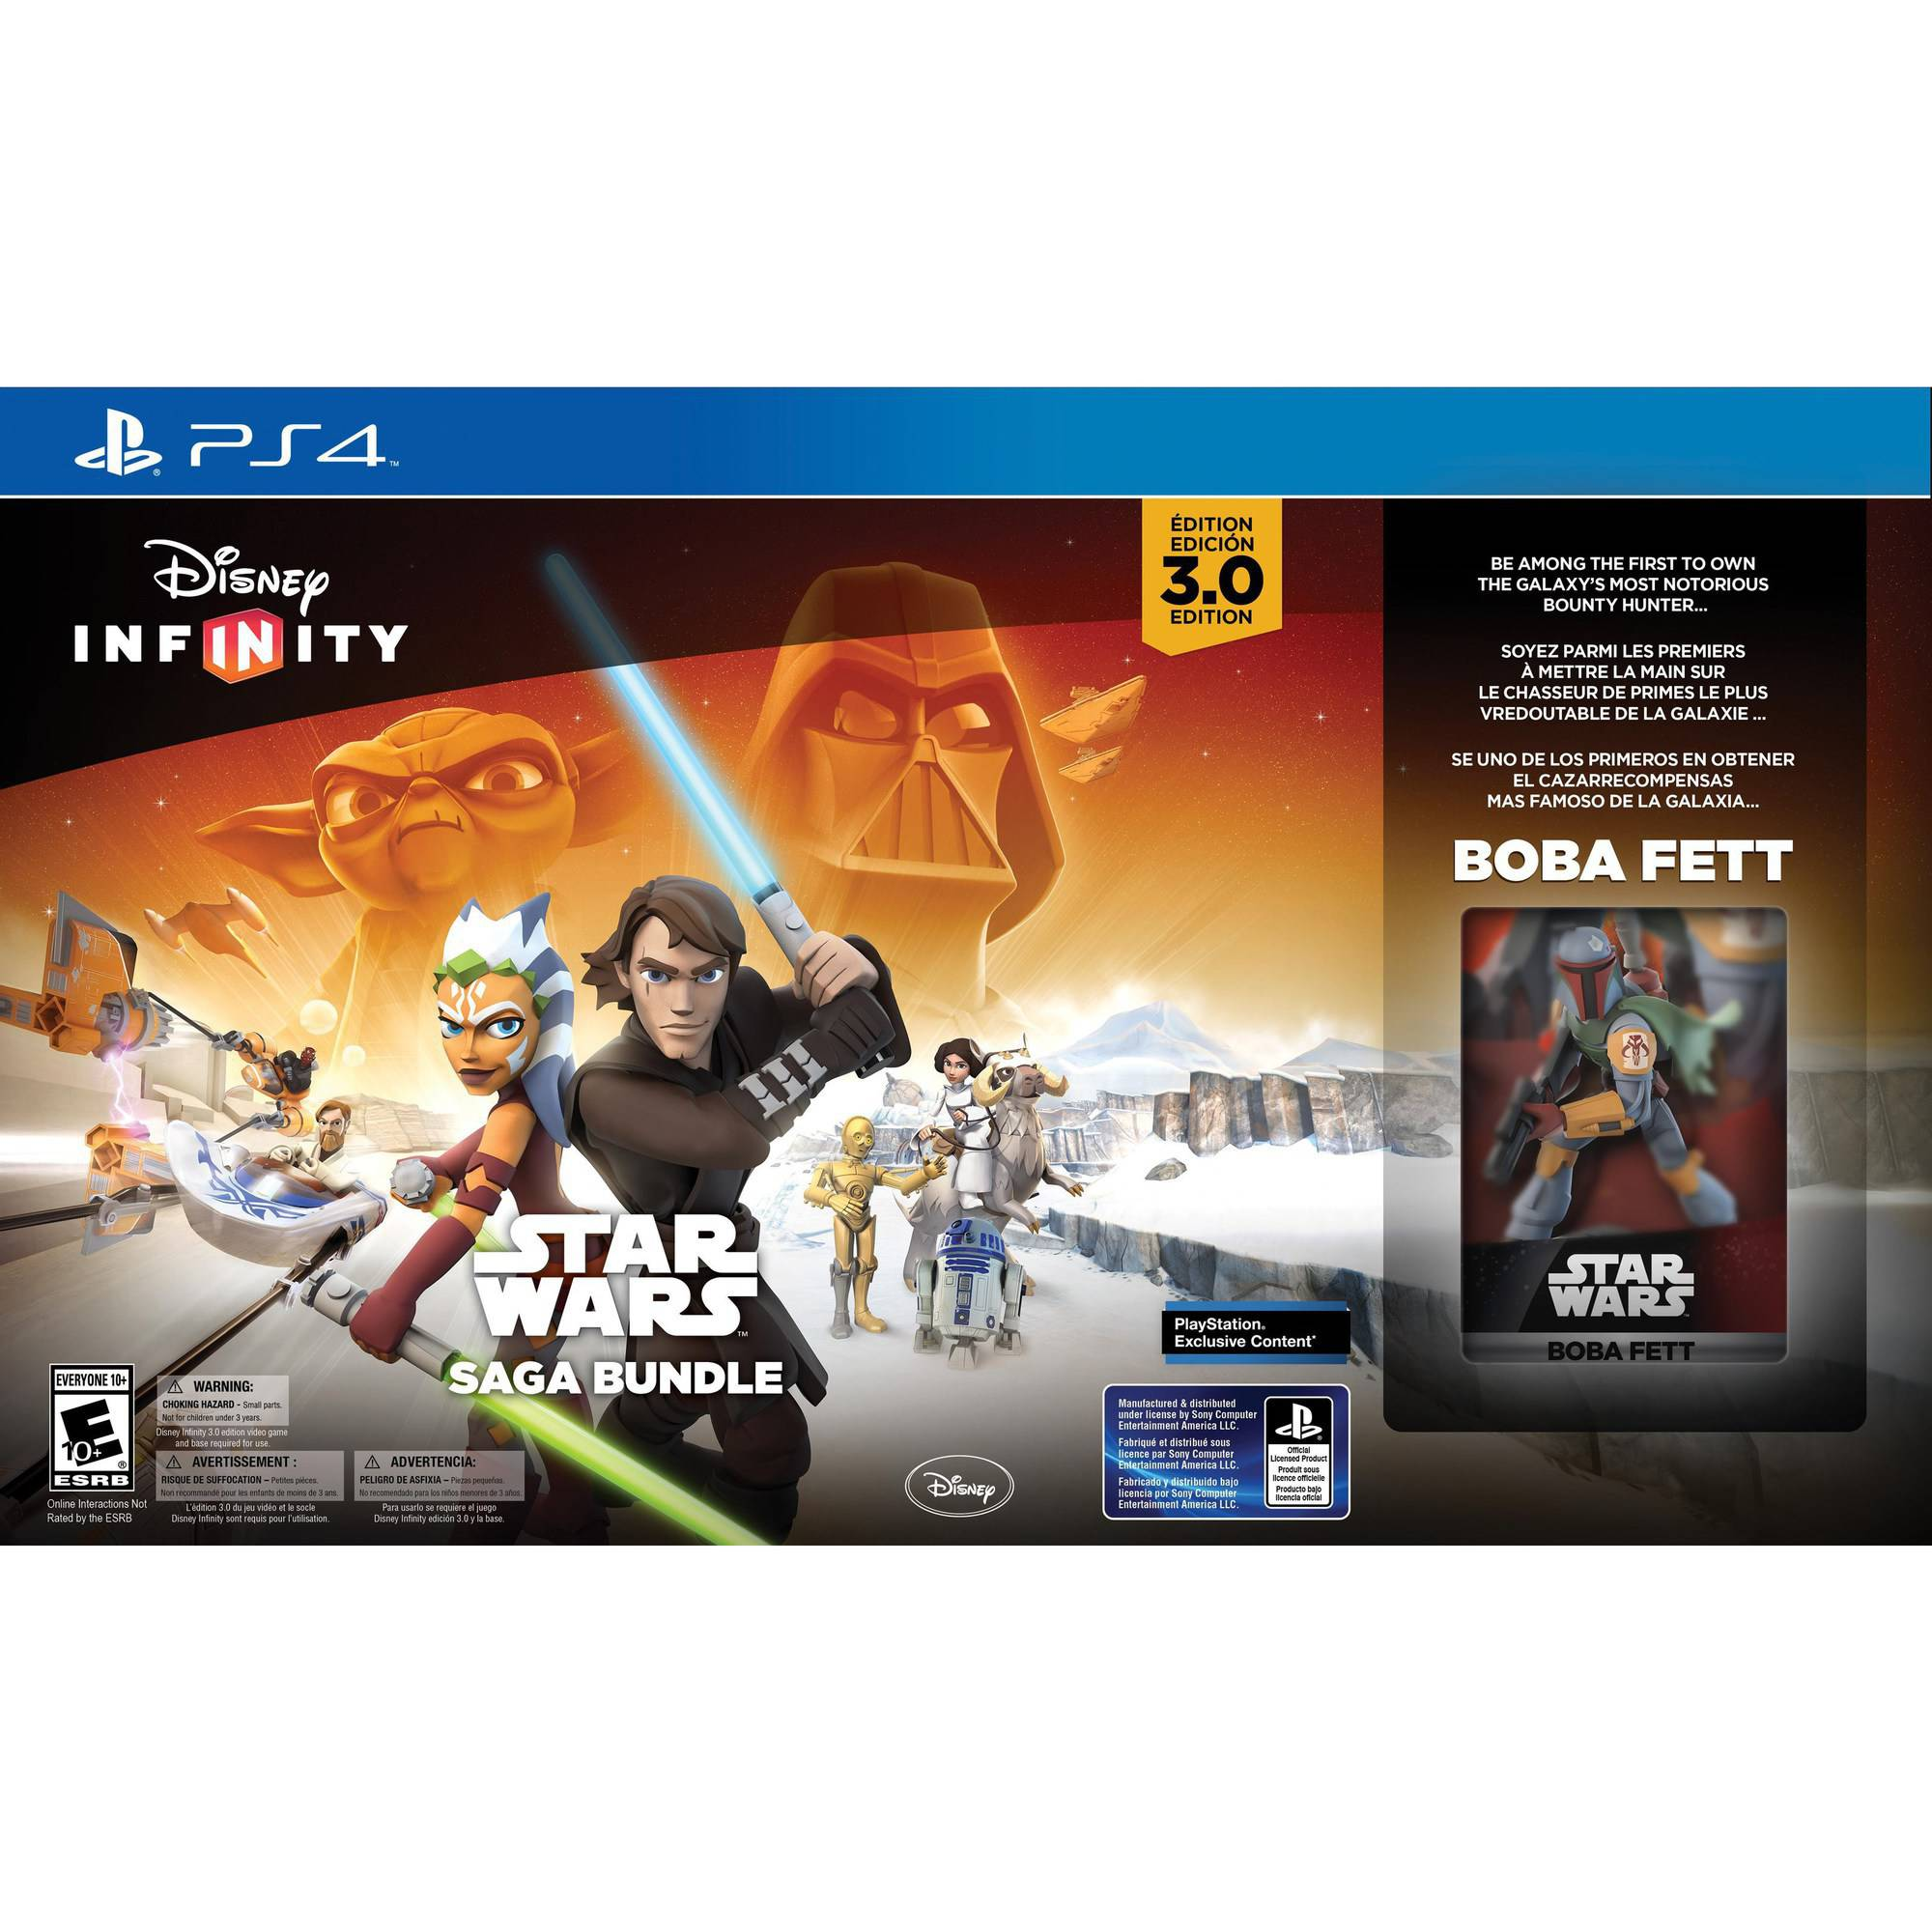 Disney Infinity 3.0 Star Wars Saga Bundle (PS4)